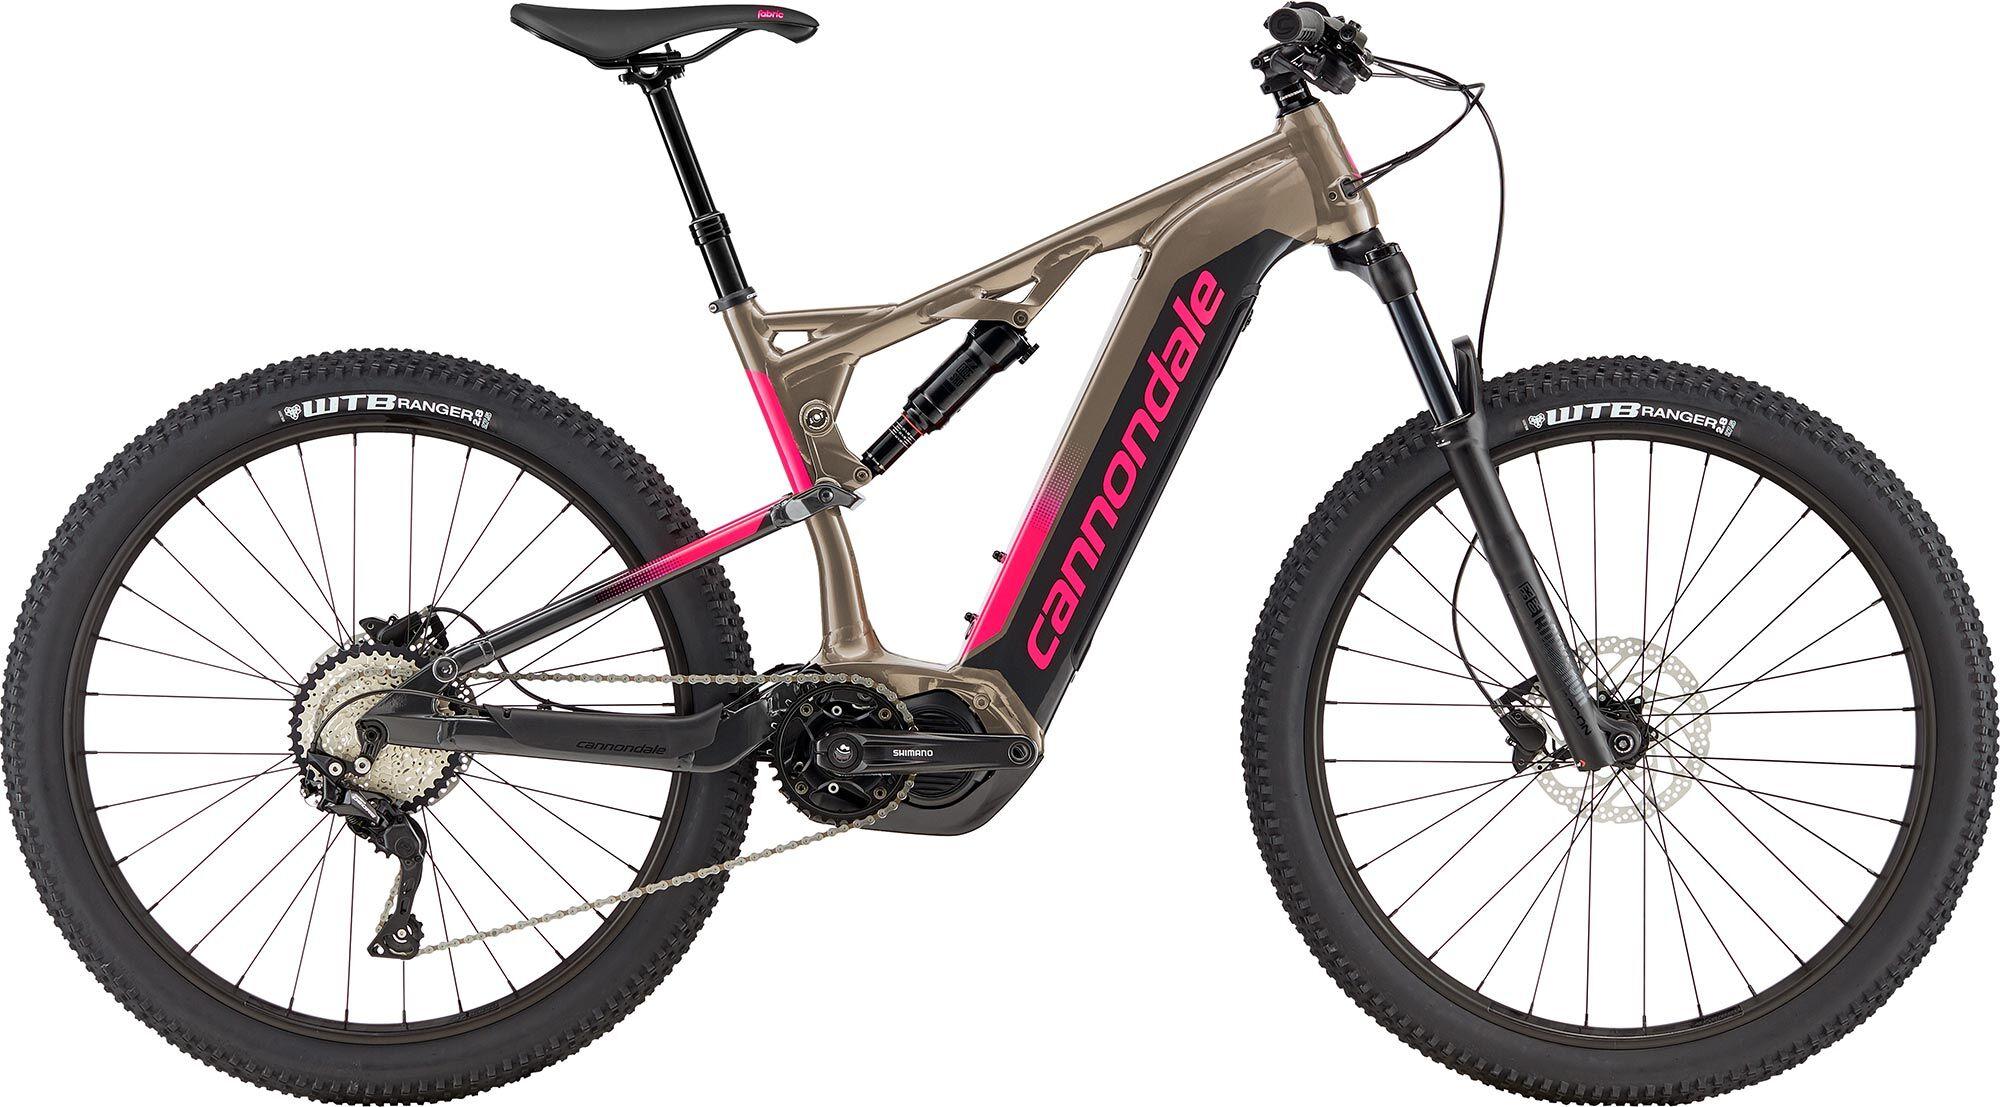 Cannondale e-Mountainbike Cujo Neo Women 4 2019 - grau pink